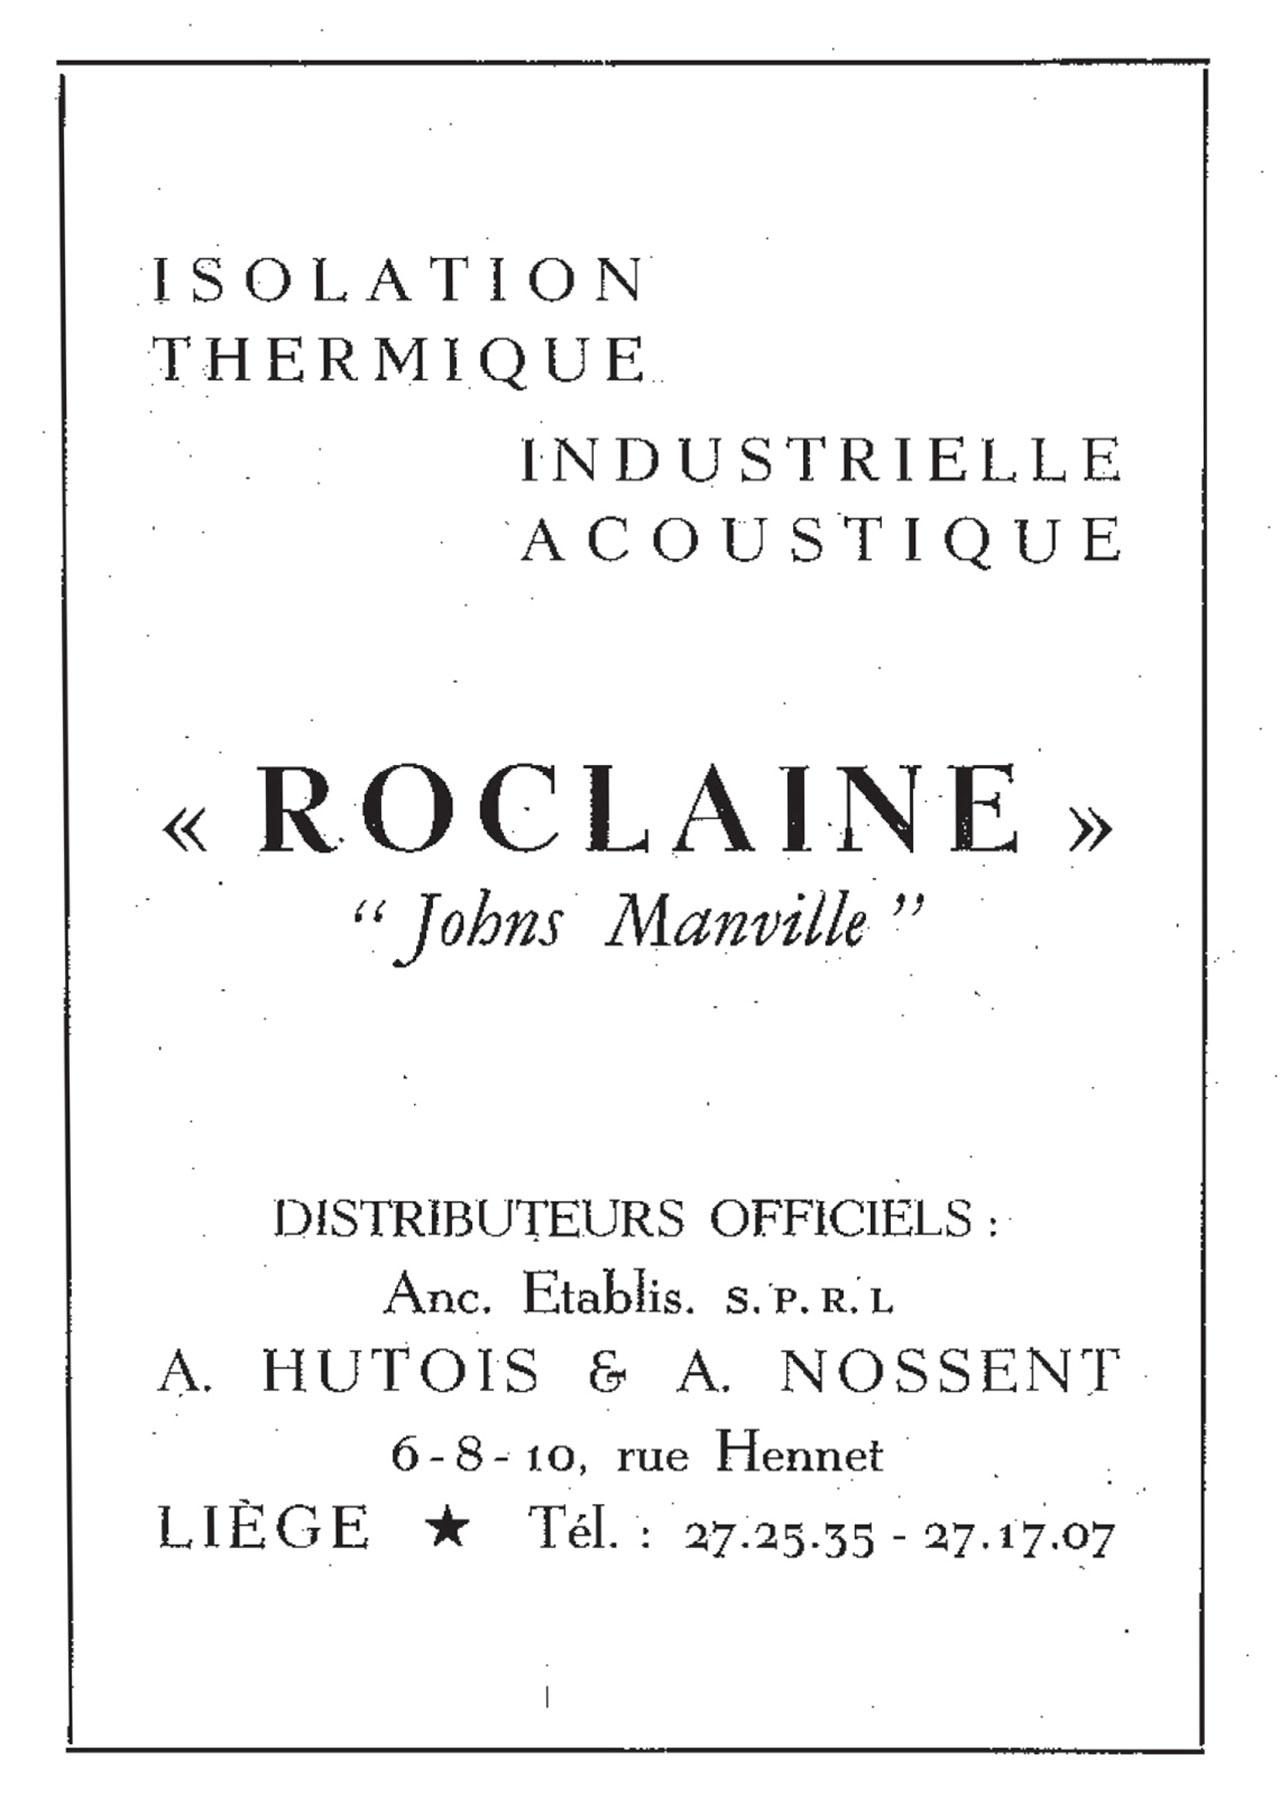 Roclaine